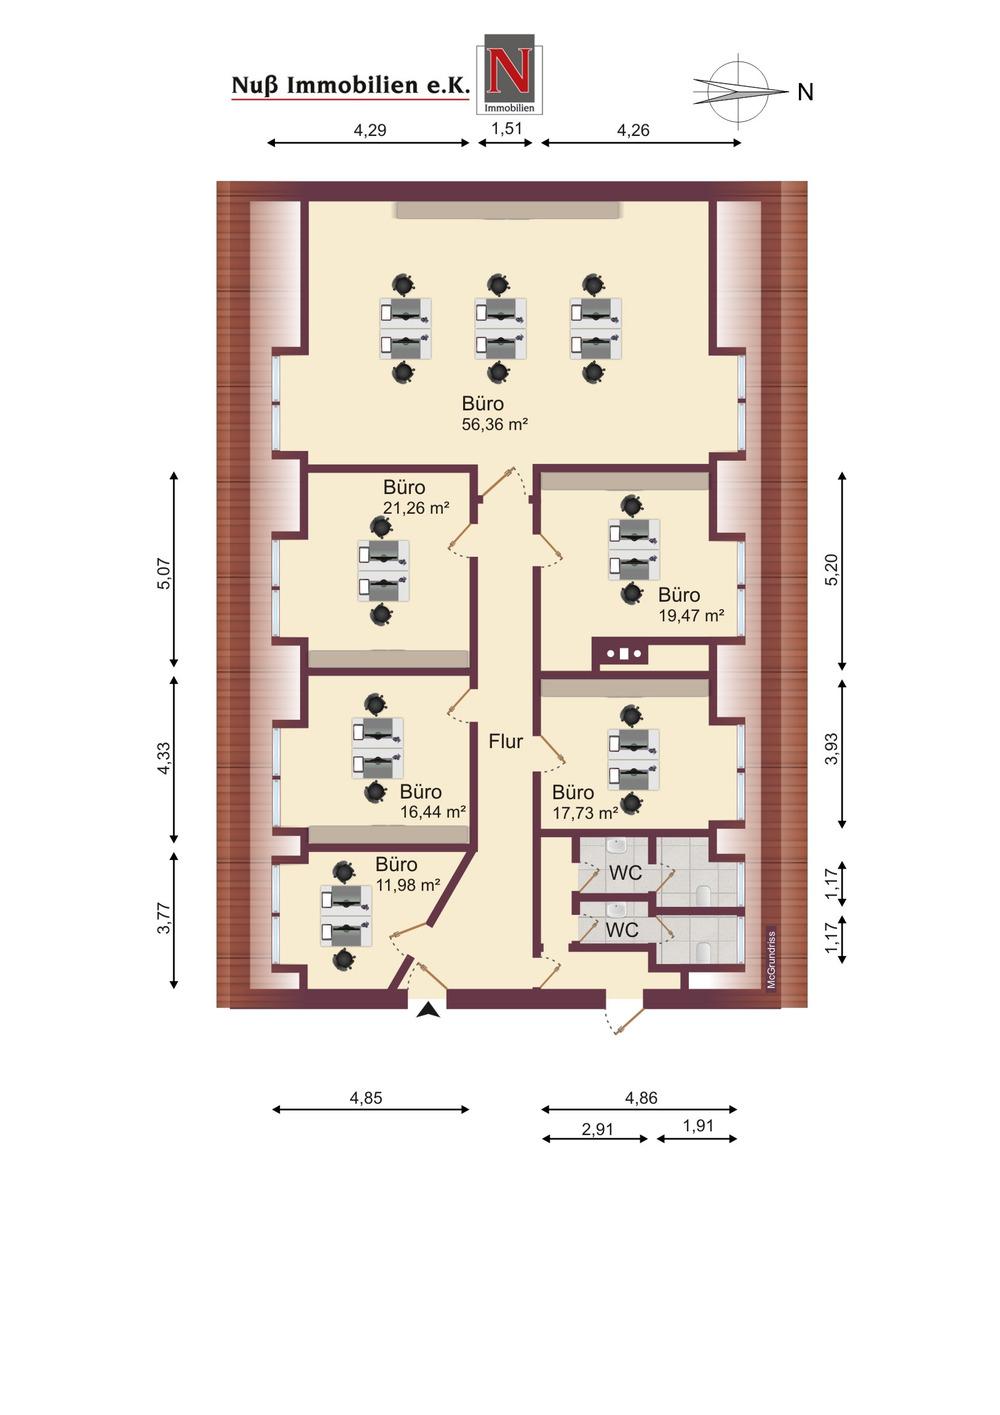 3106-Grundriss-neu